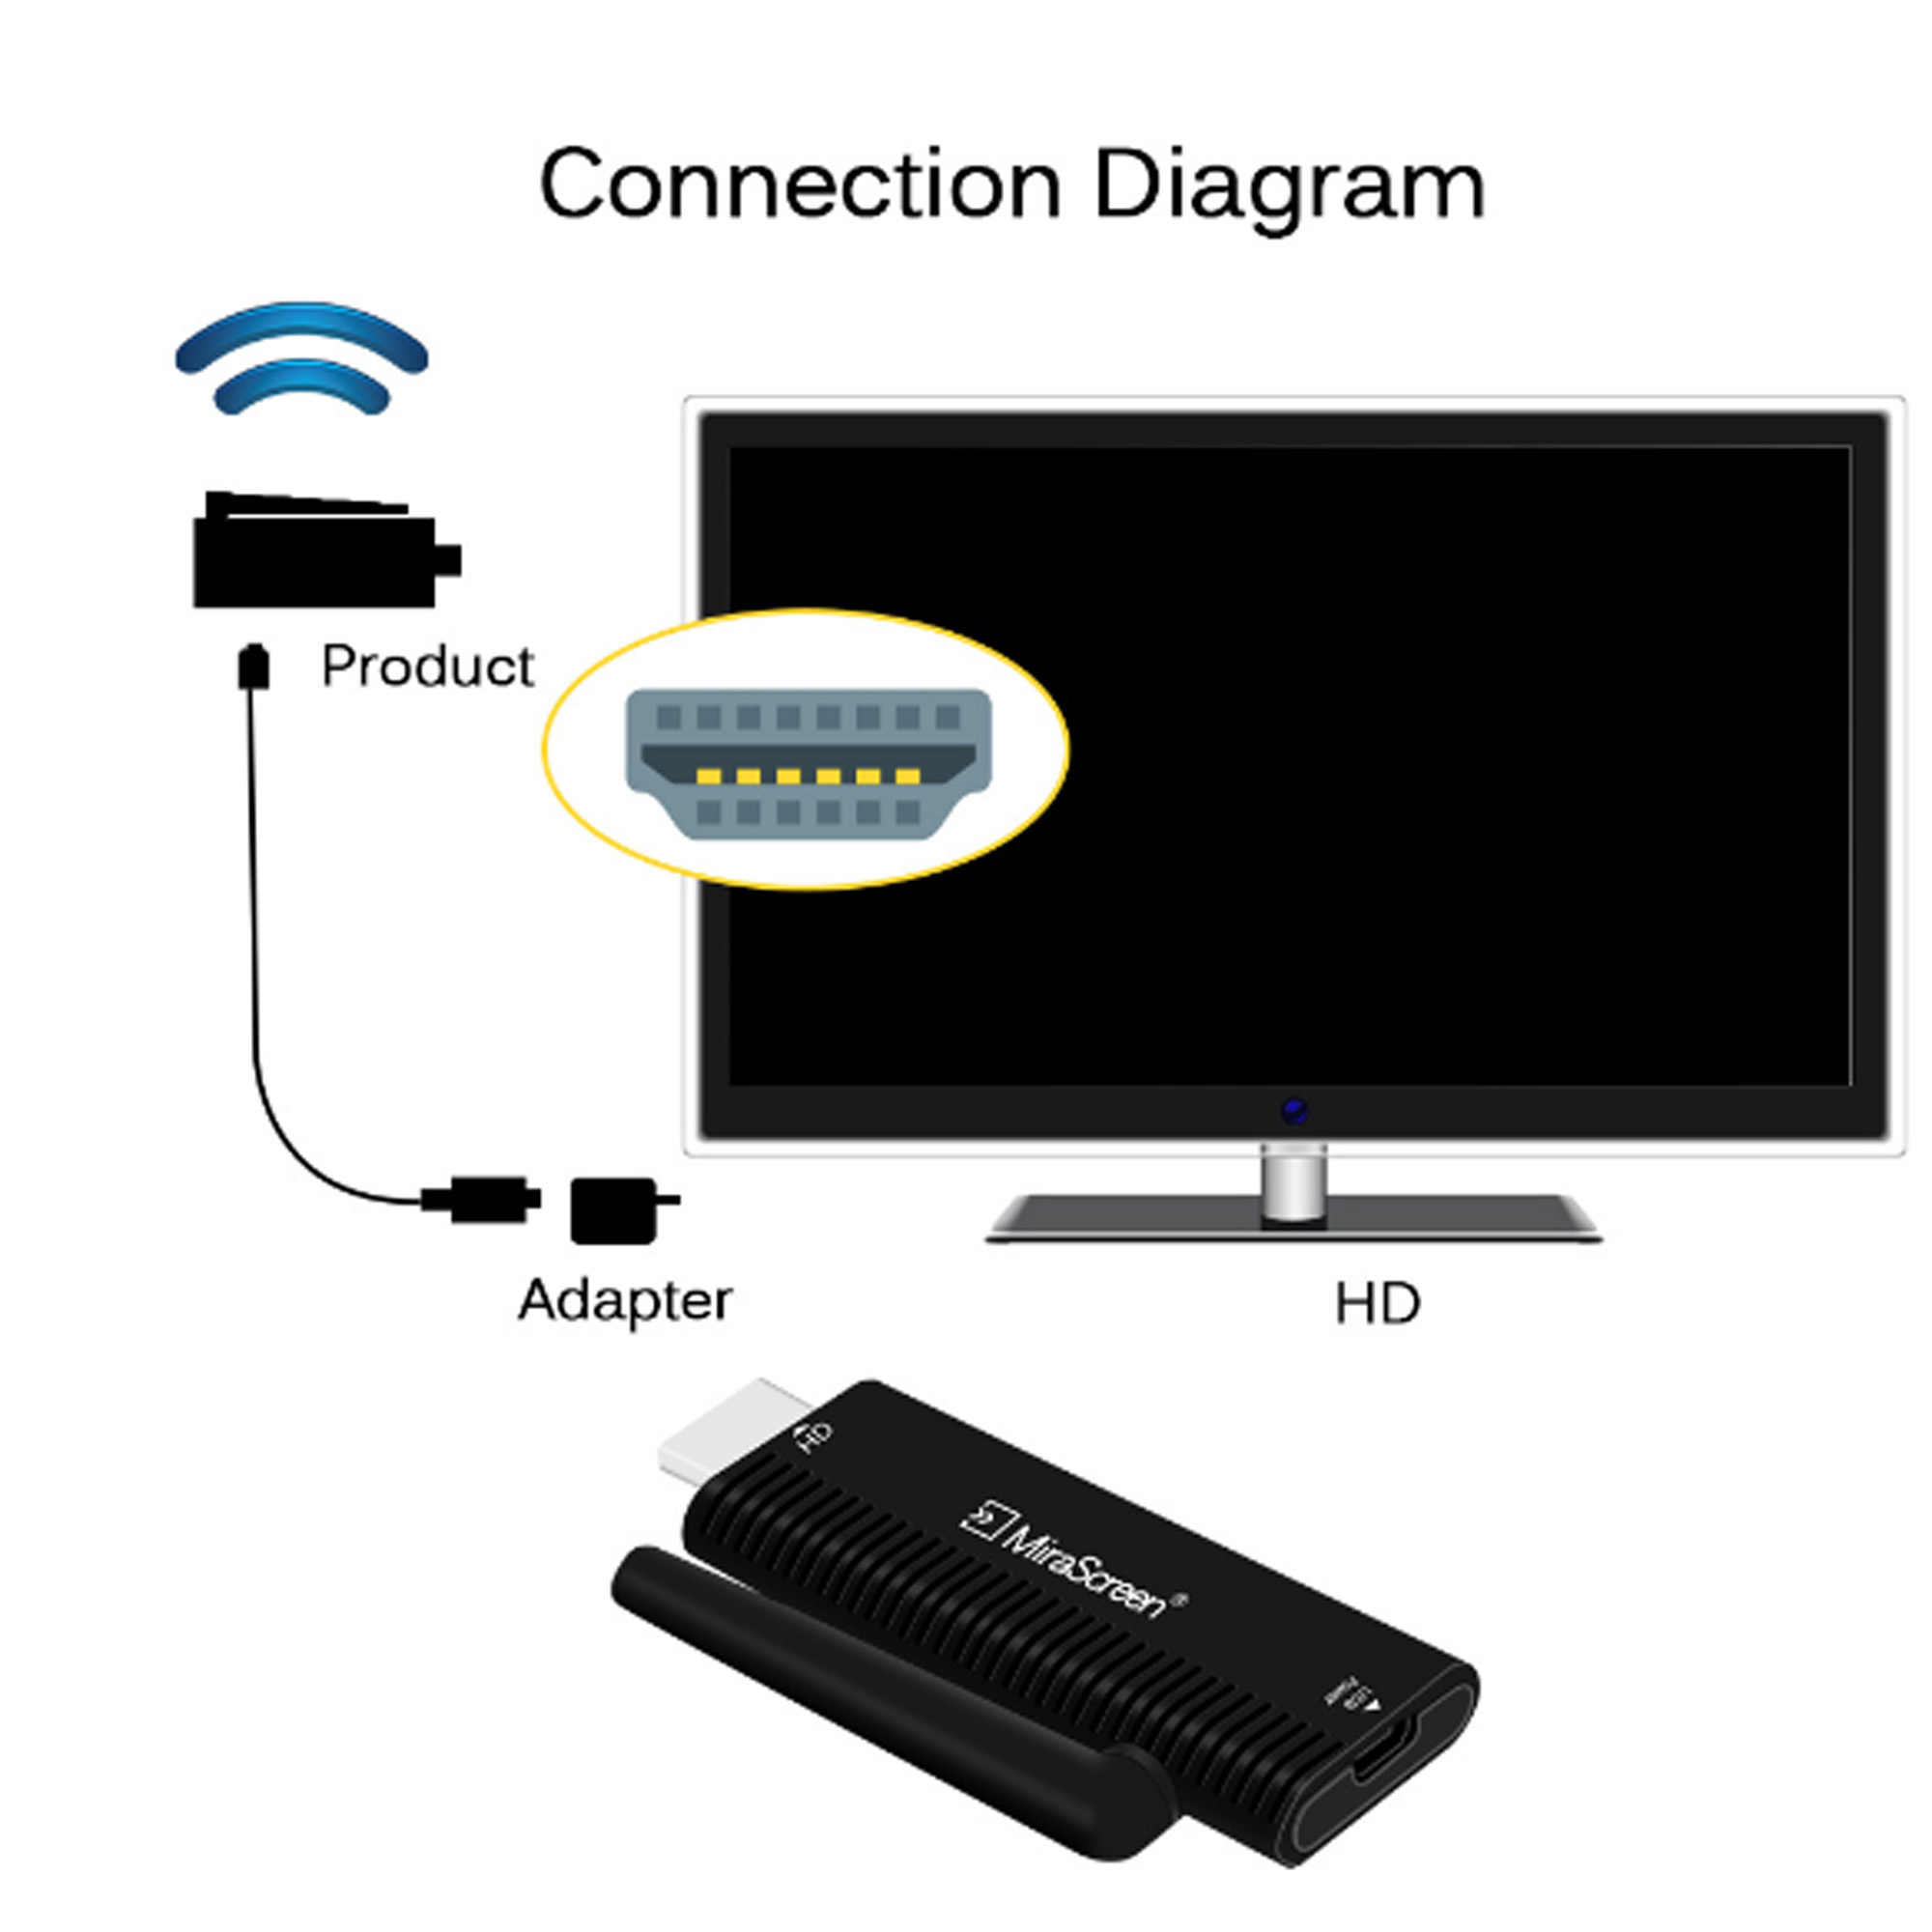 Yeni MiraScreen kablosuz HD 1080P WiFi ekran Dongle TV çubuk mini PC Miracast DLNA alıcısı yüksek kalite